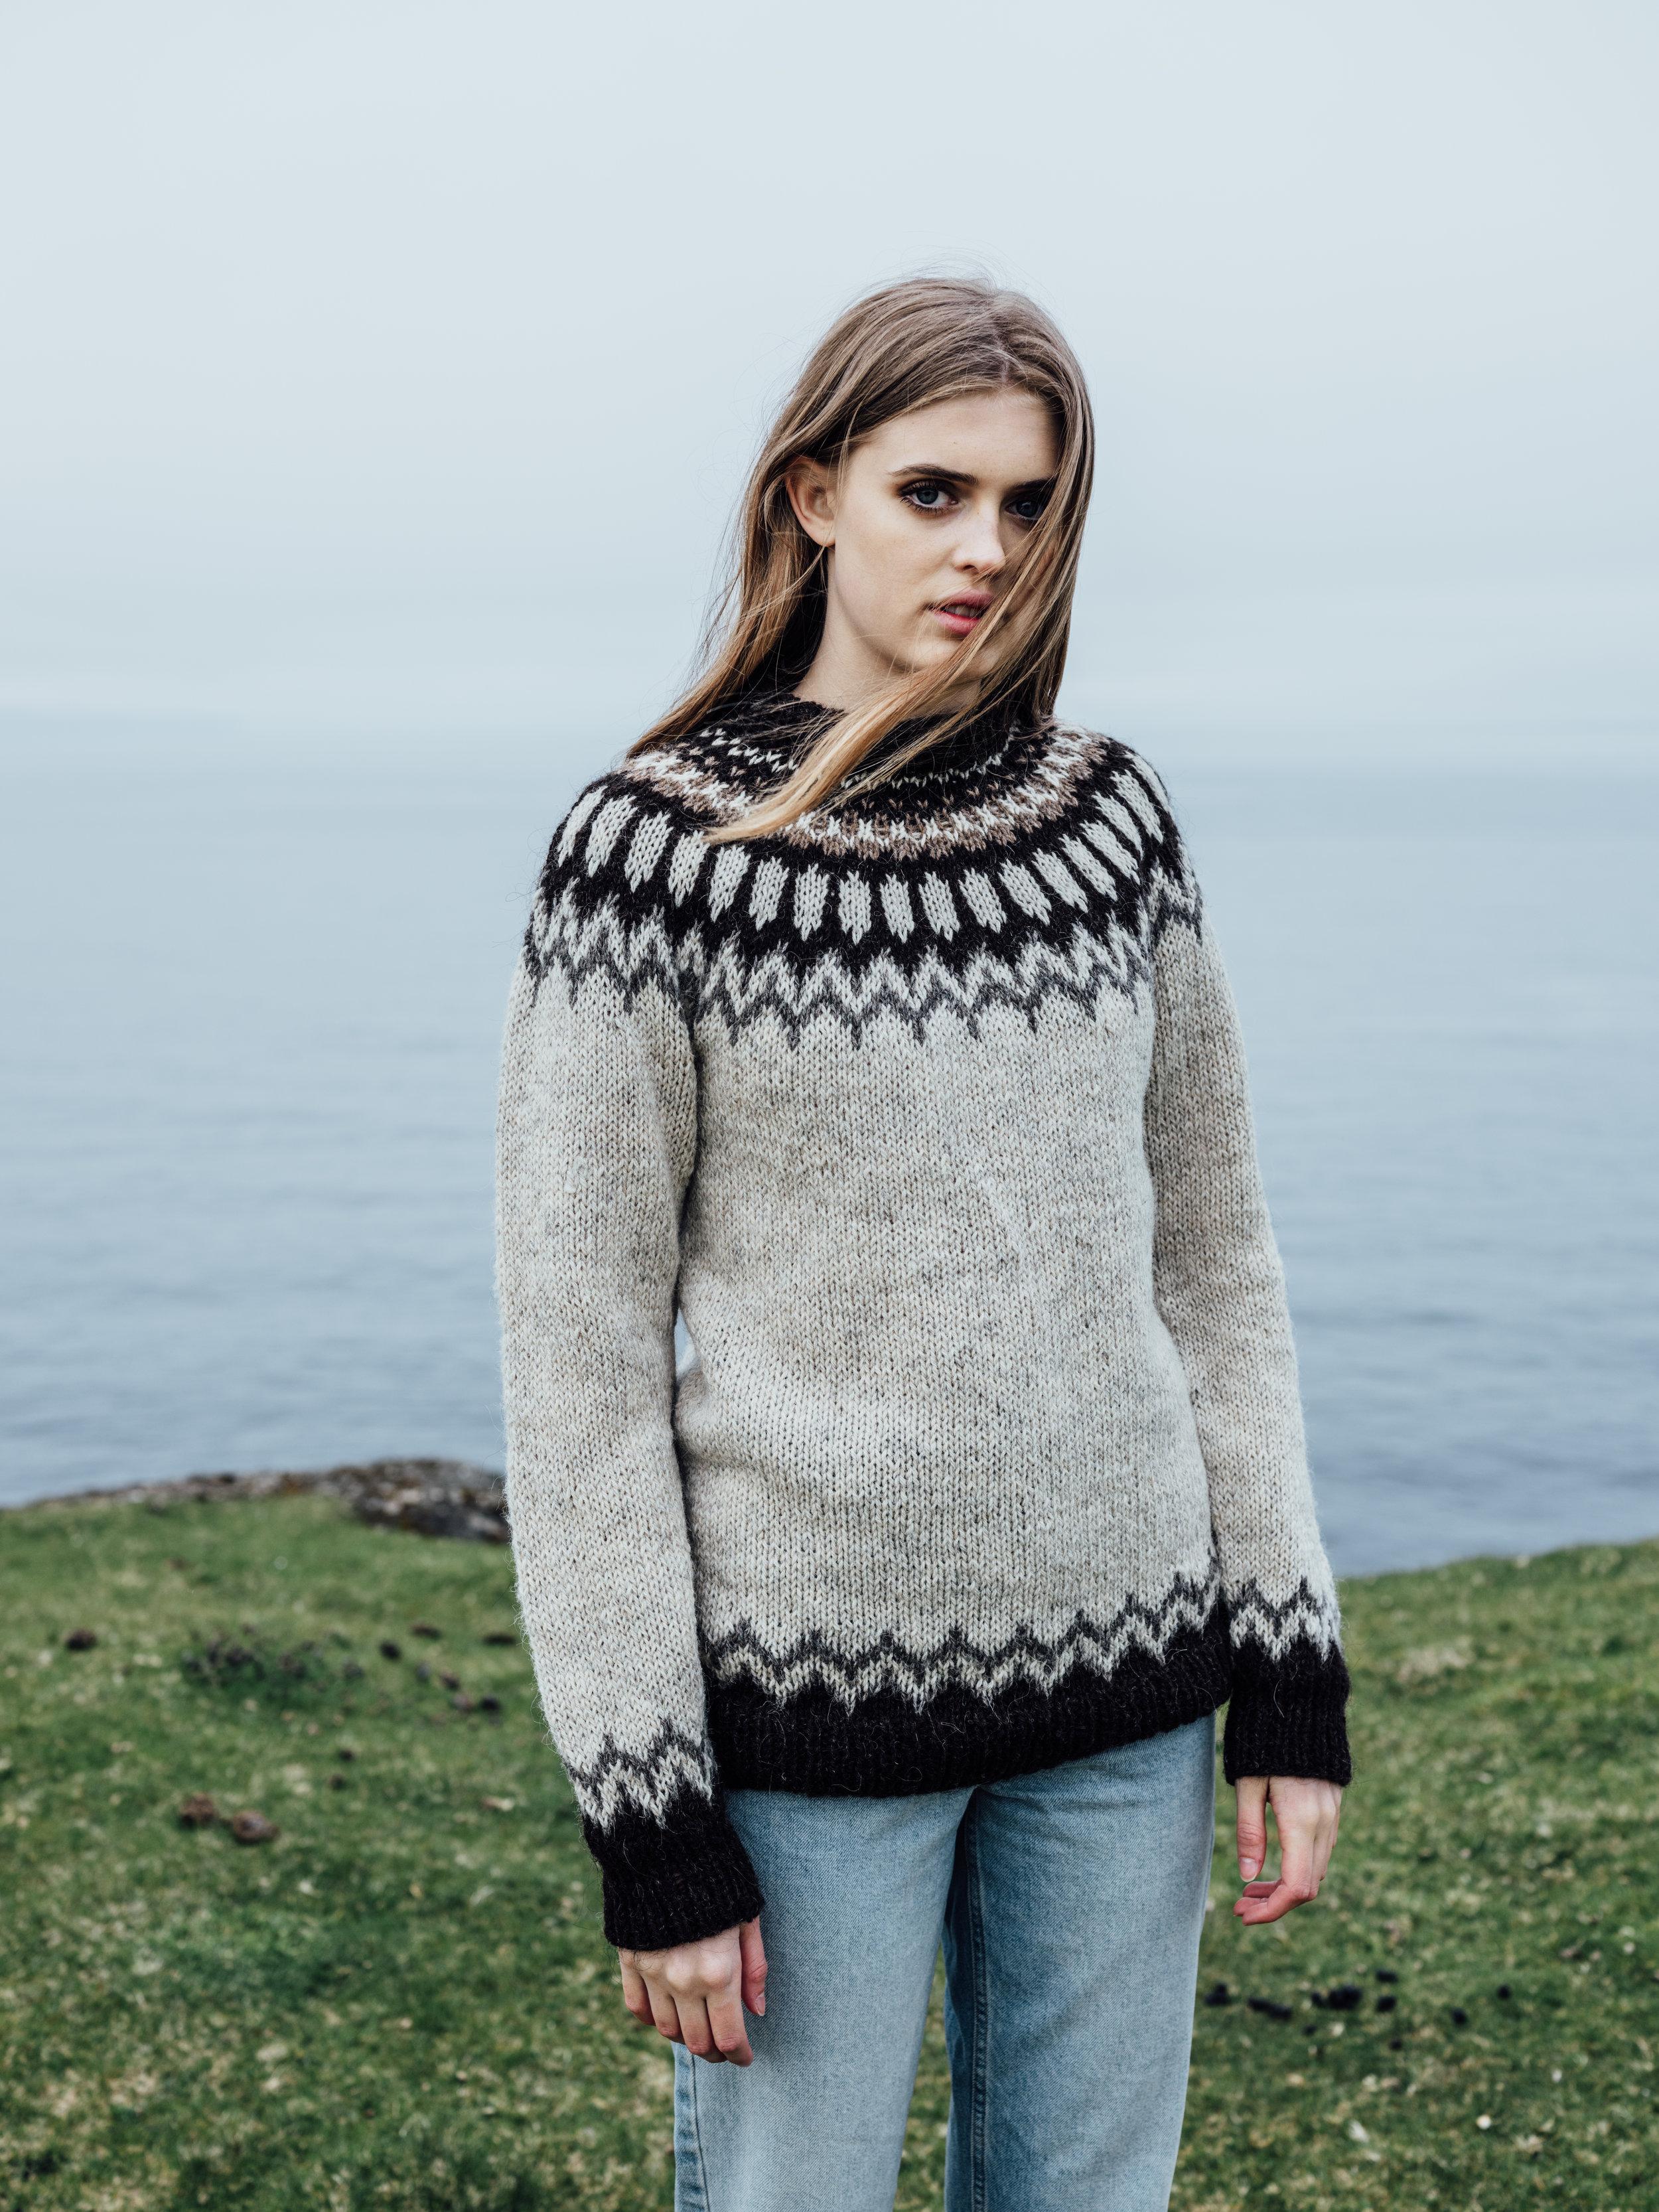 Troyggja Við Mynstur (Sweater with Round Pattern)